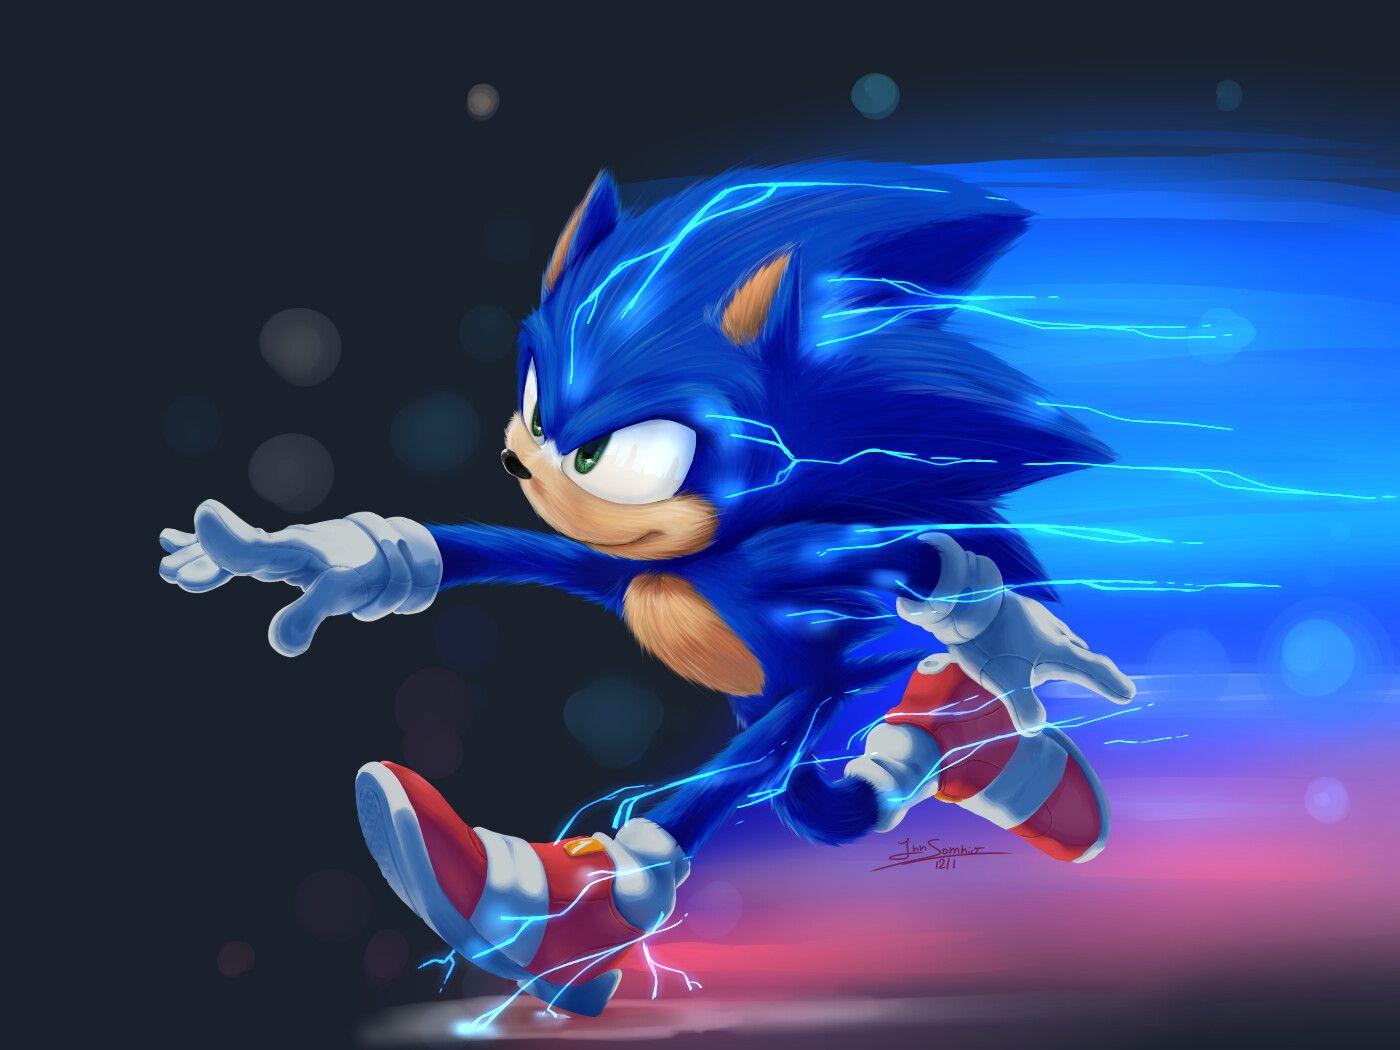 Fanart Sonic Movie Innsomnio Animator On Artstation At Https Www Artstation Com Artwork 58gbxj Sonic Sonic And Shadow Sonic Fan Art